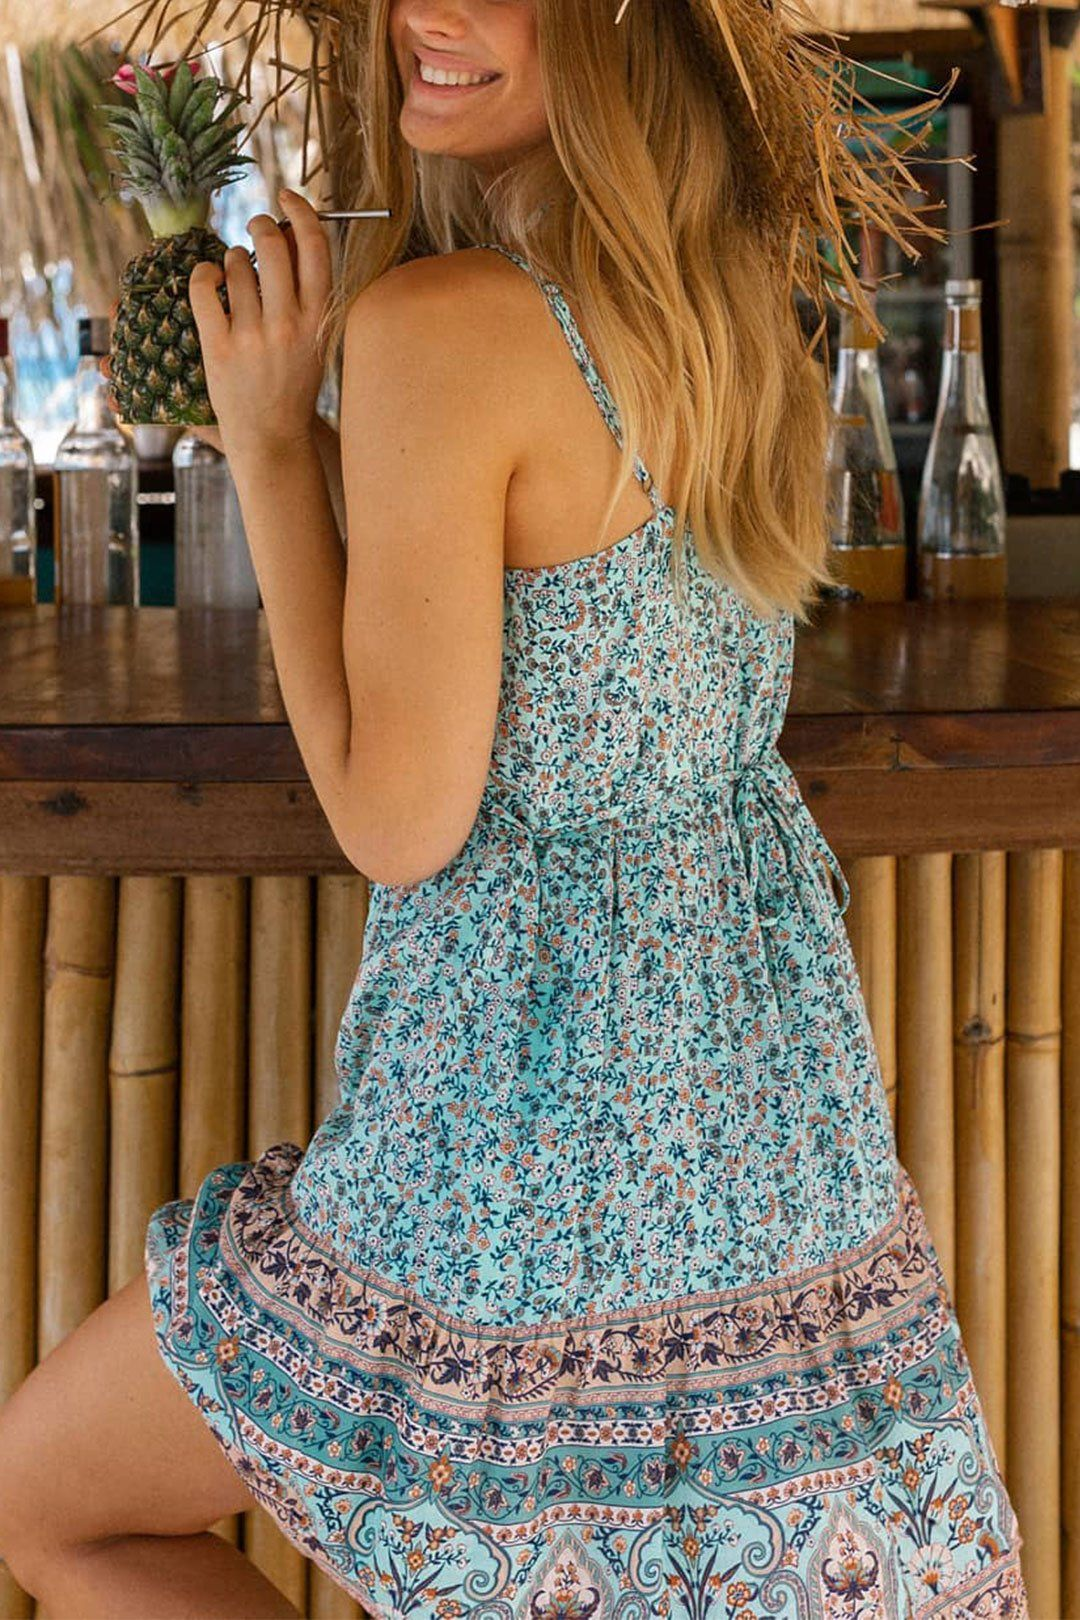 Mini Dress Boho Dress Pristine Island Strappy In River Blue Only 30 99 Free Shipping Bohofashion Bohoch Boho Dress Boho Chic Dresses Casual Mini Dress [ 1620 x 1080 Pixel ]